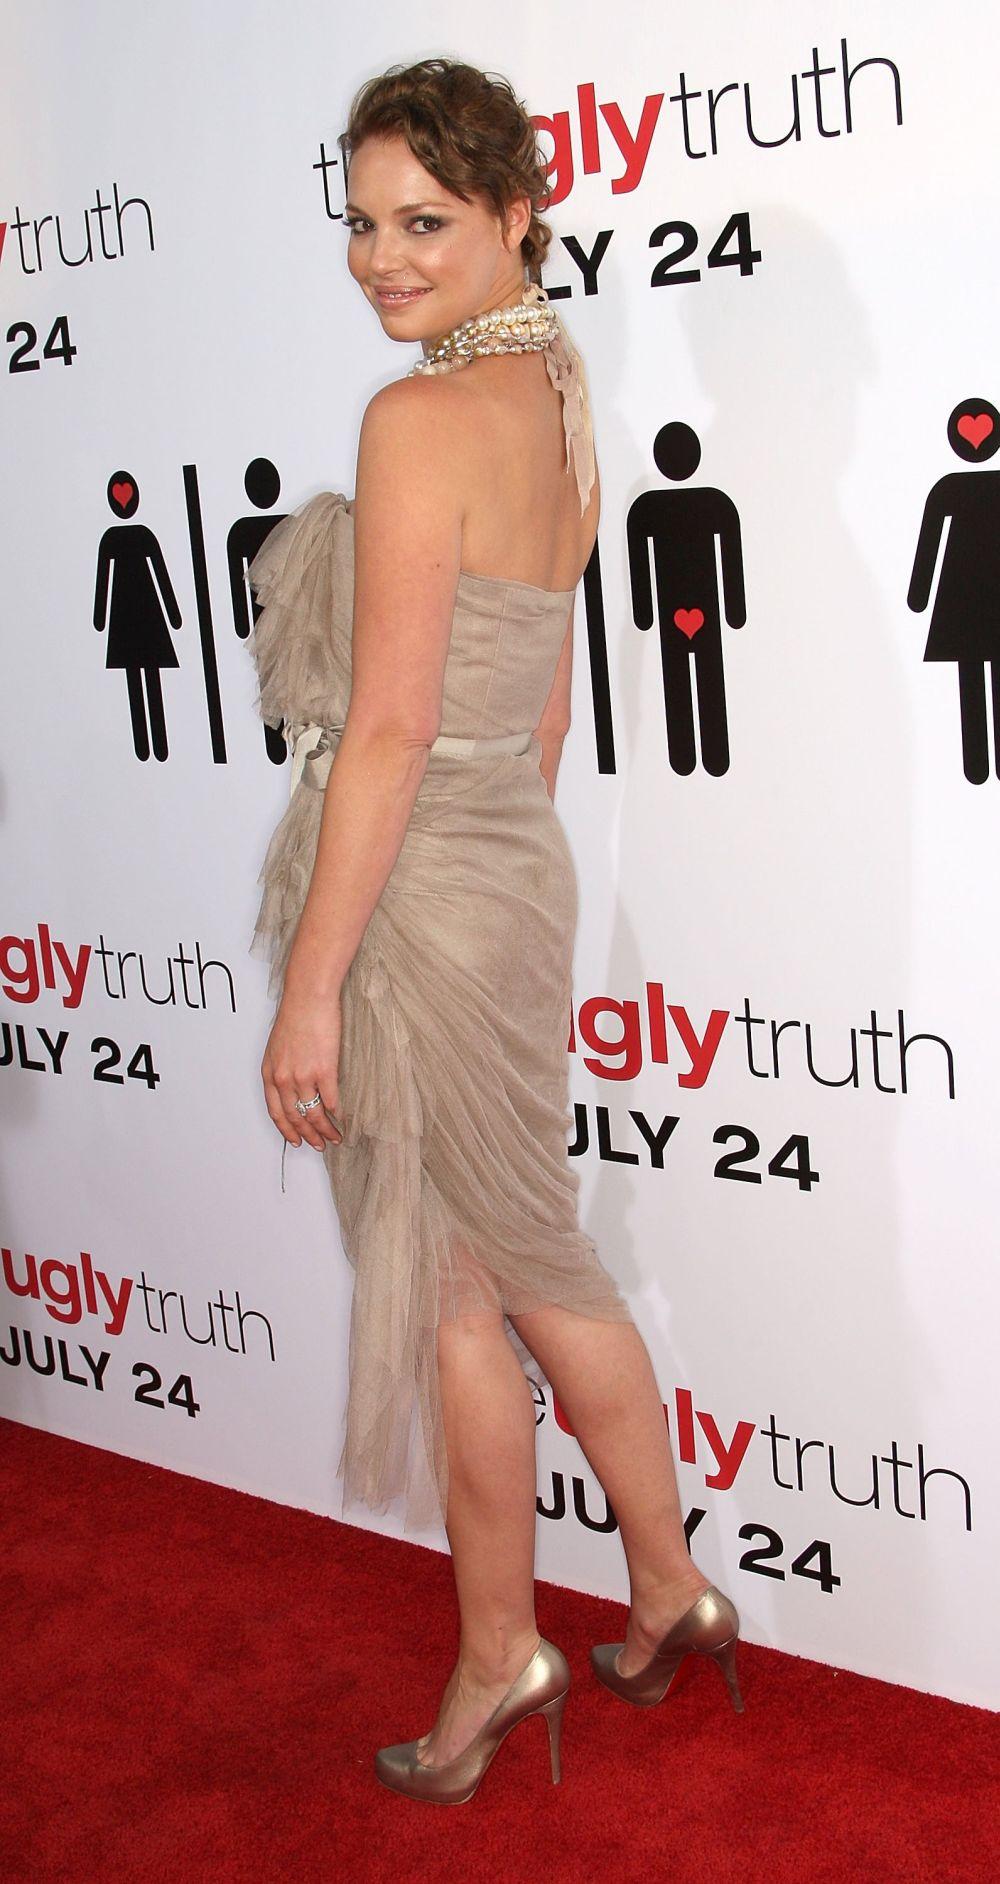 Katherine_Heigl-The_Ugly_Truth